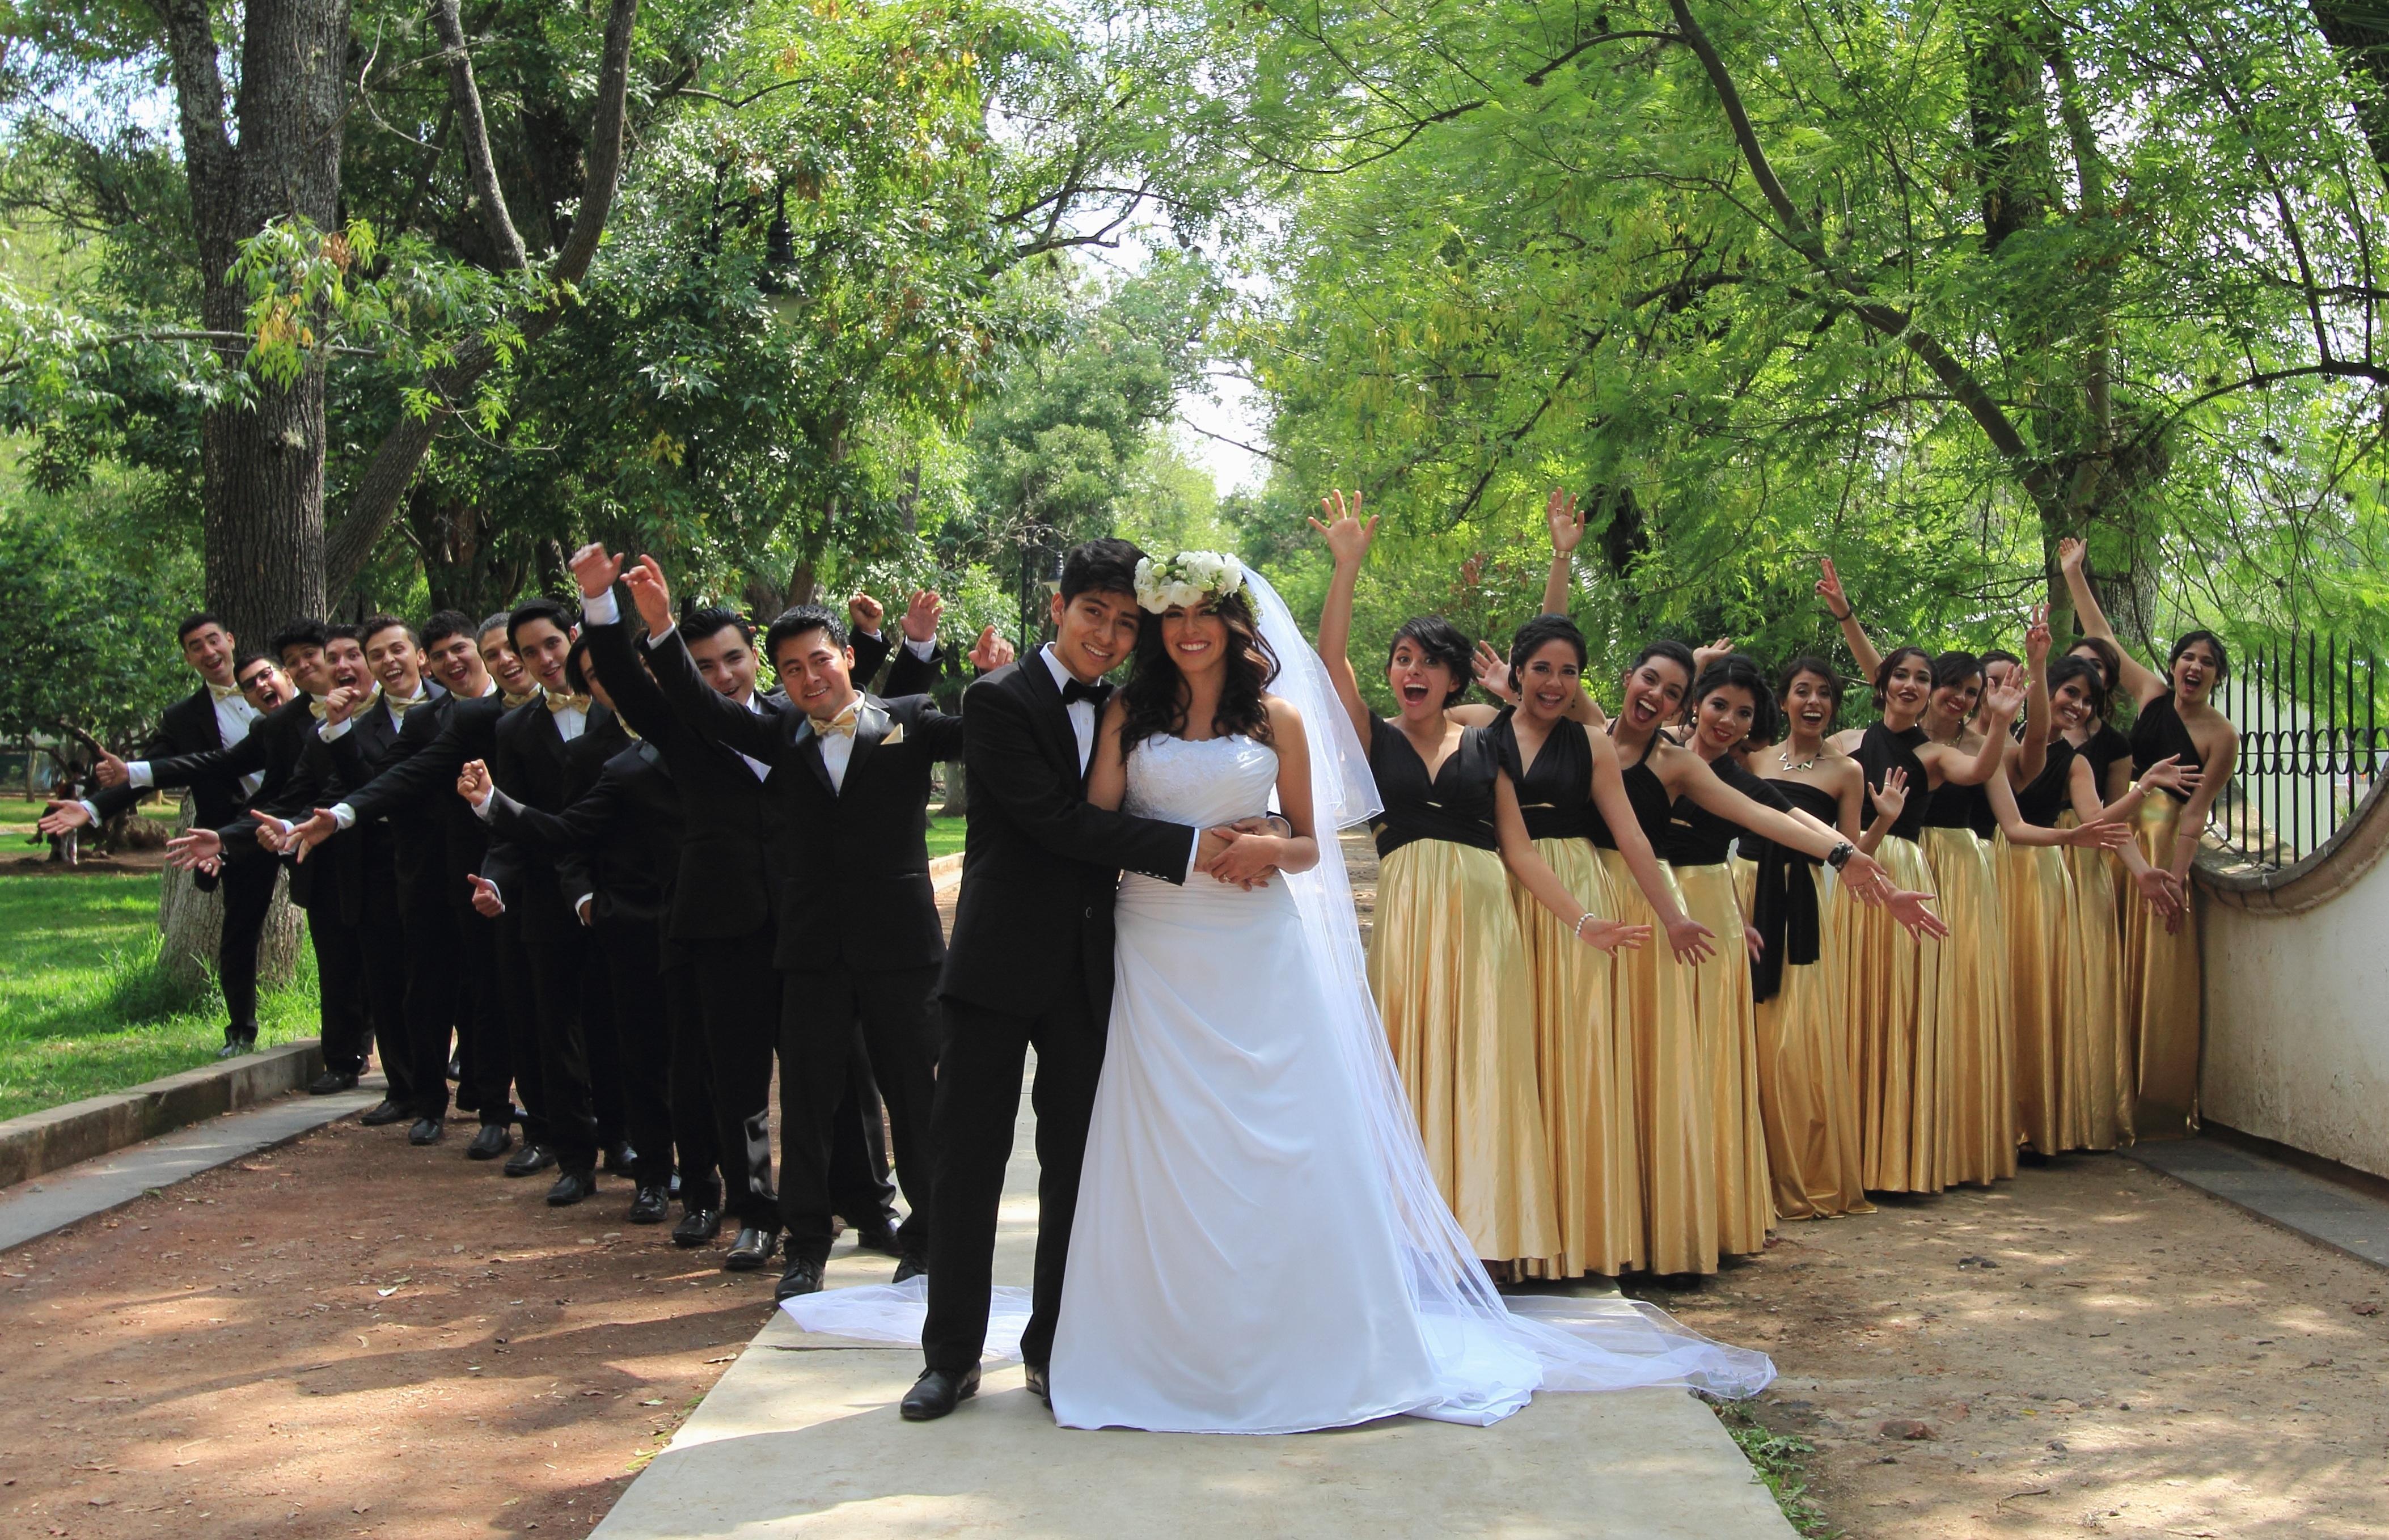 Fotos gratis : Boda, novia, novio, ceremonia, vestido, Quinceanera ...